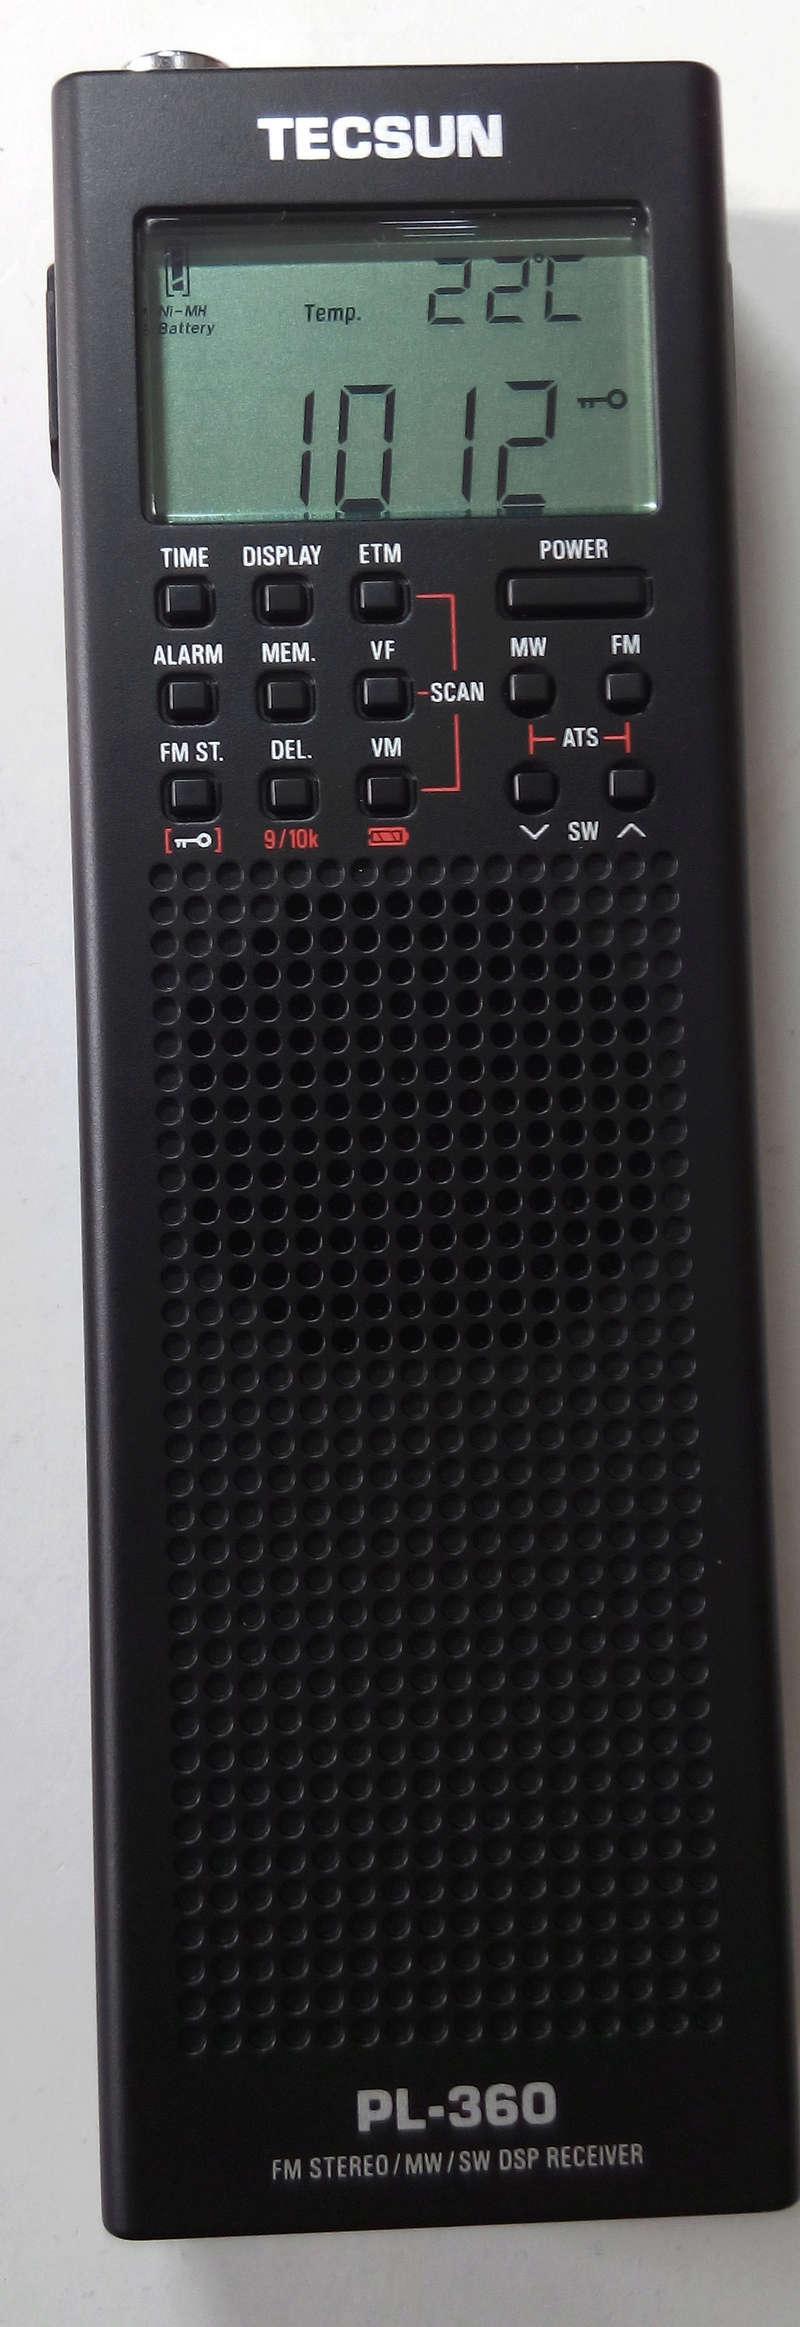 Radio Tecsun11